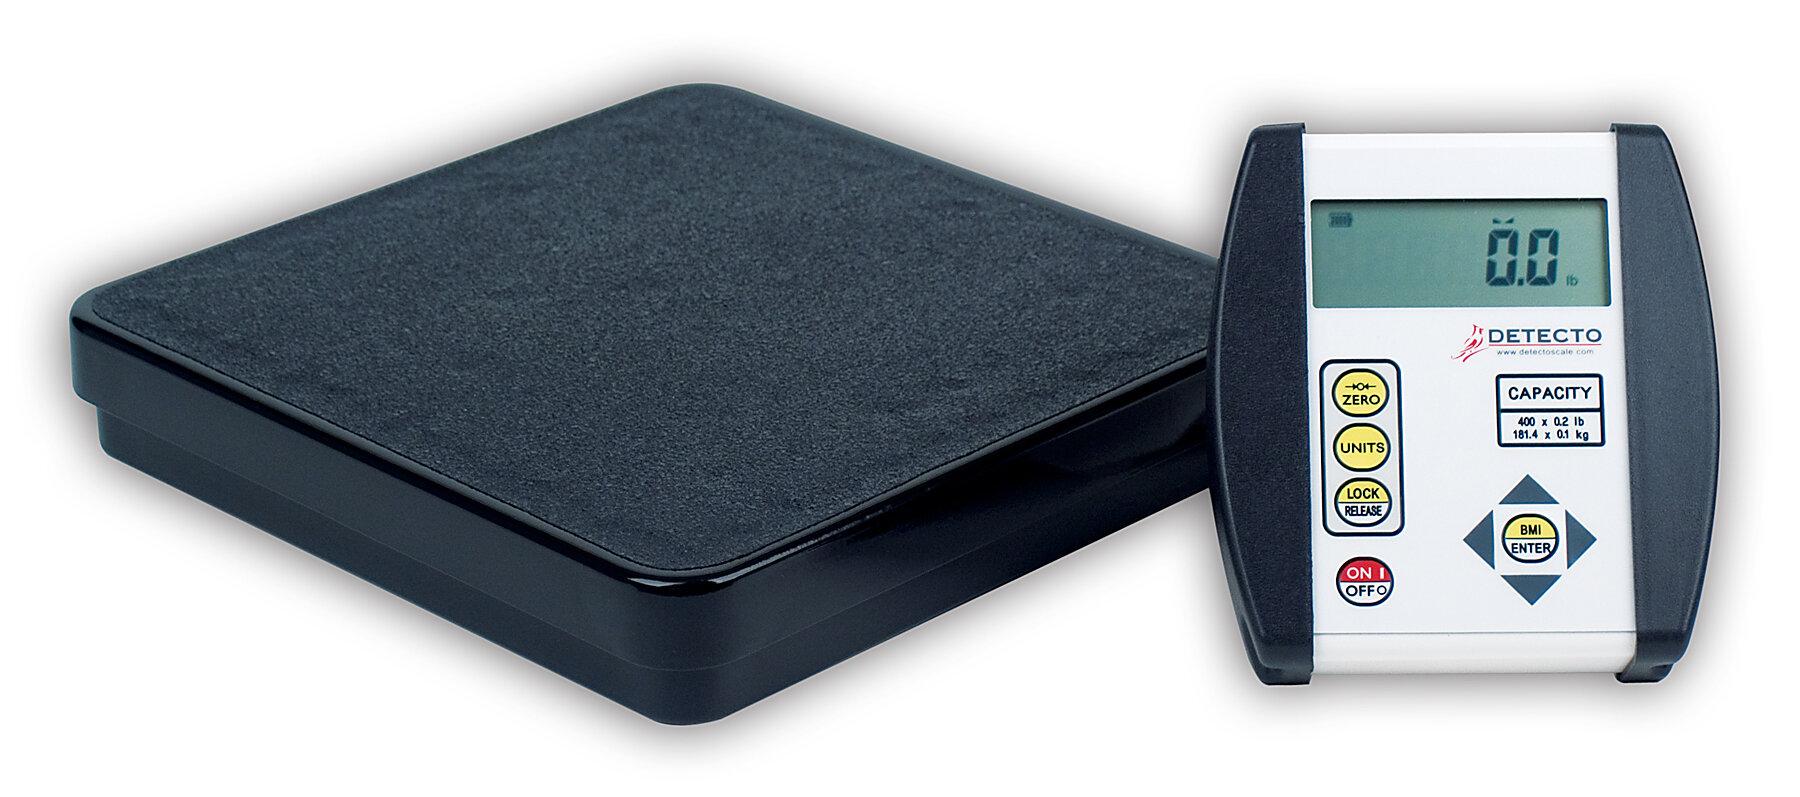 Detecto General Purpose Portable Scale Dr400 750 Wayfair